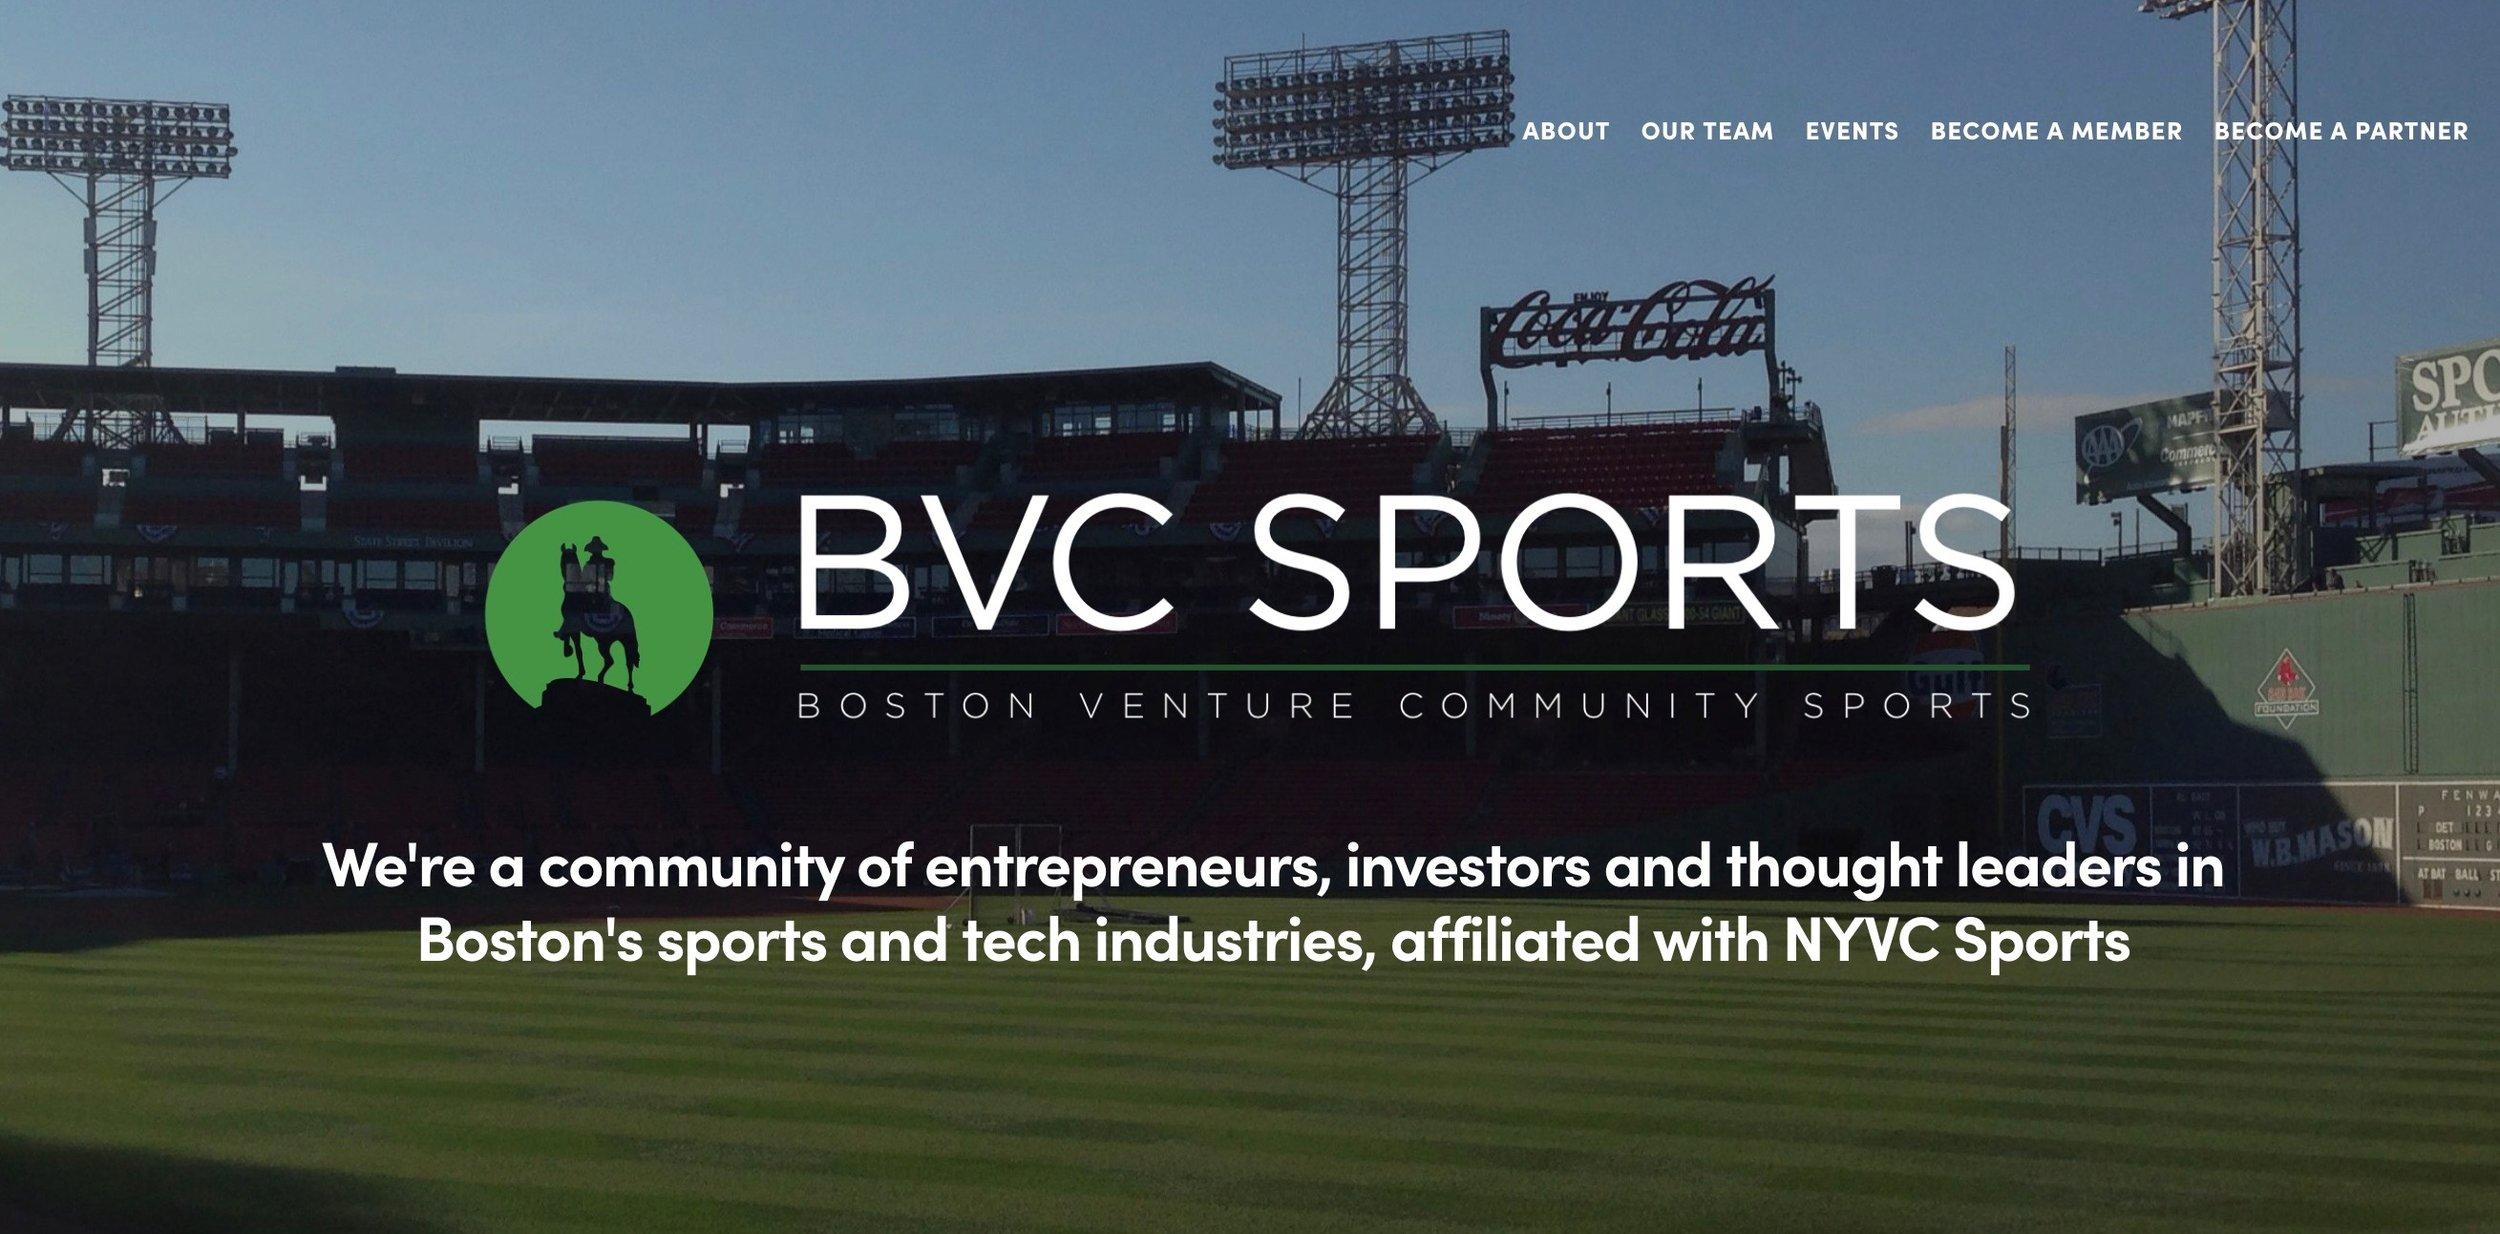 Boston VC Sports.jpeg